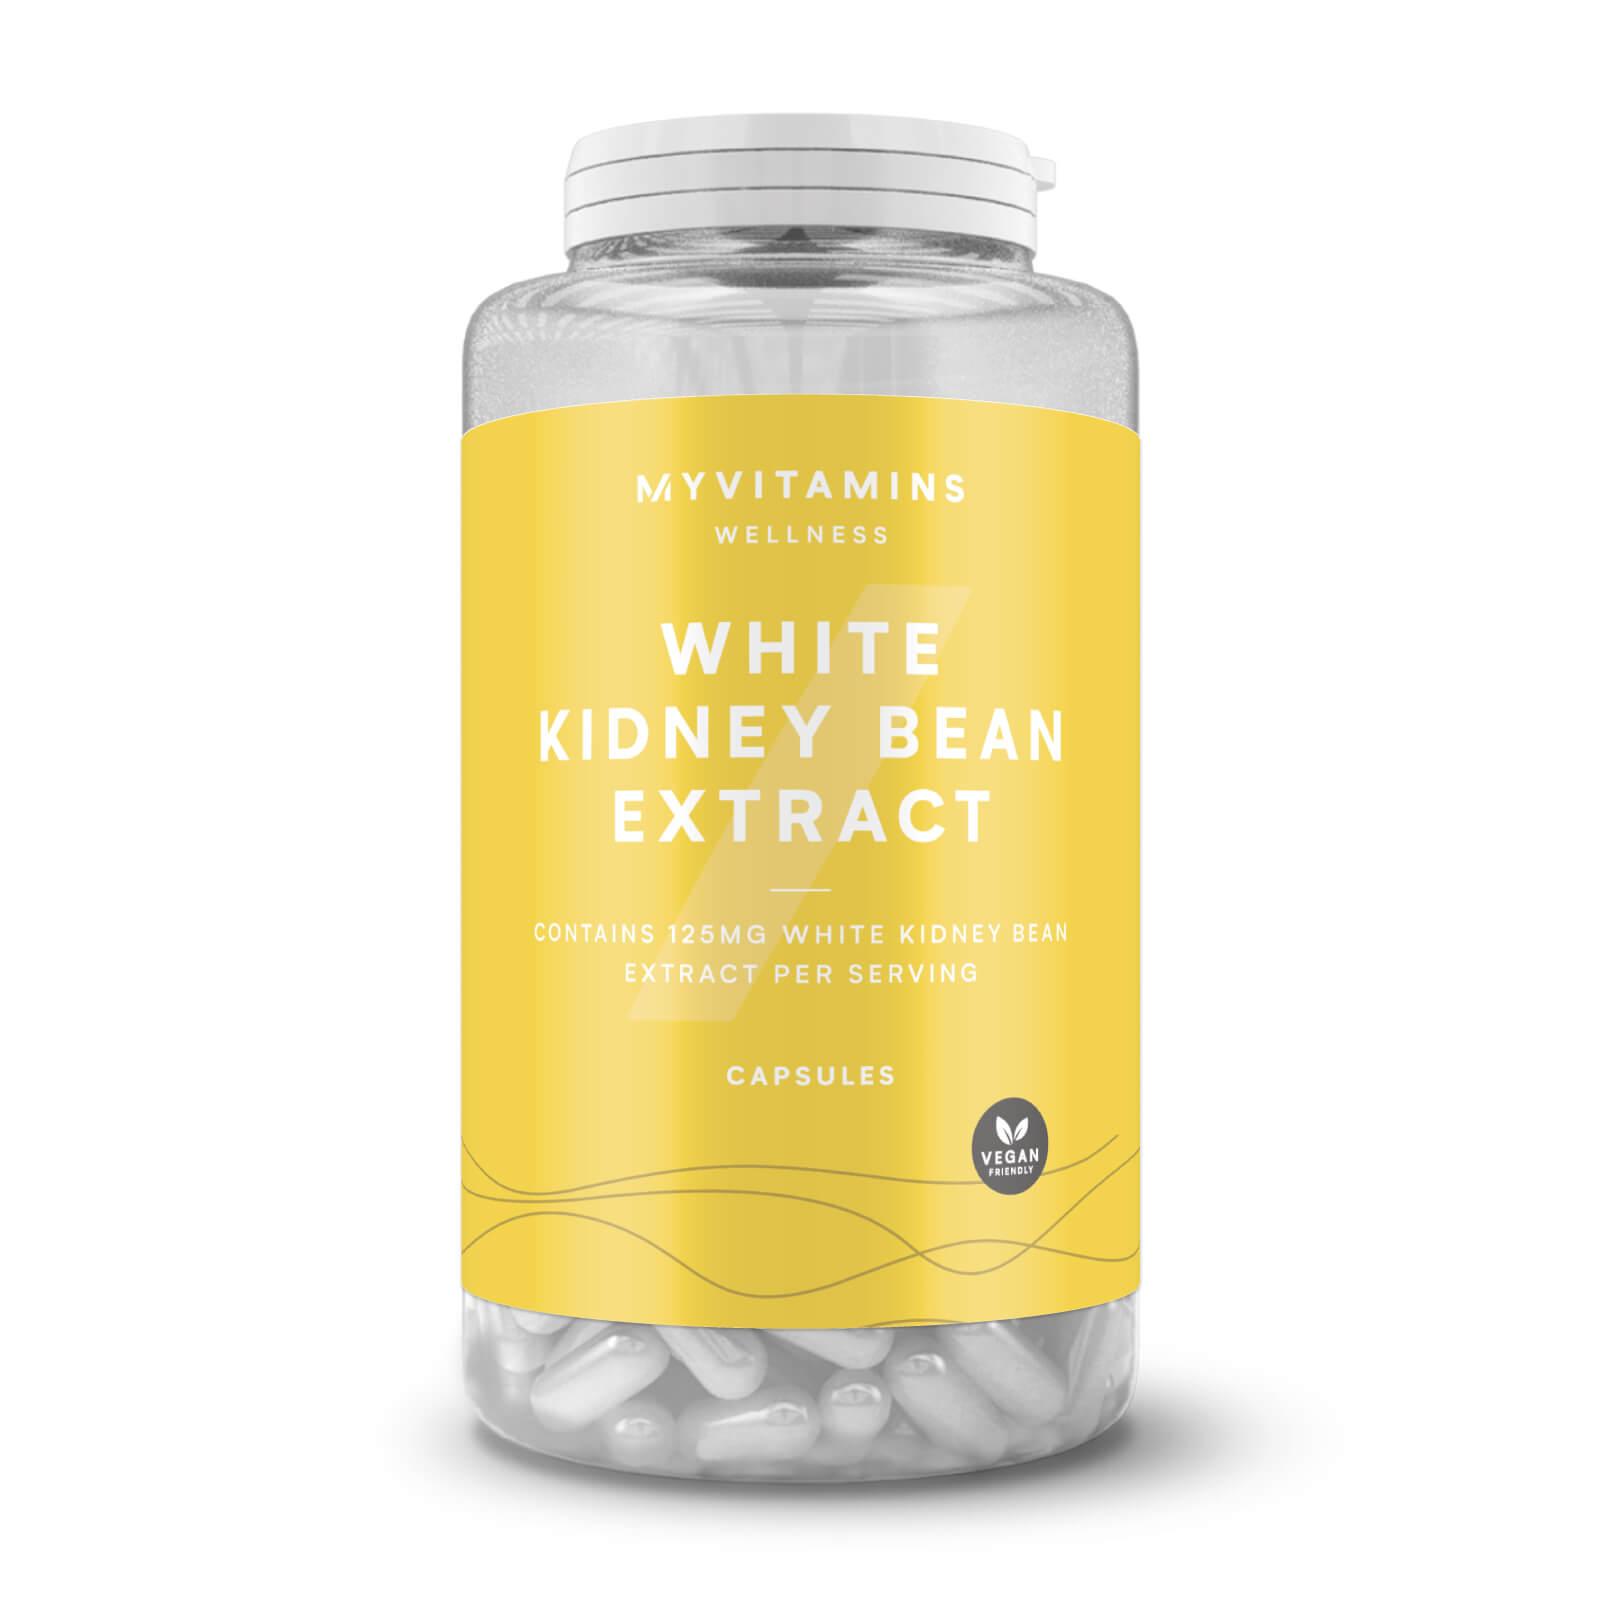 Myvitamins White Kidney Bean Extract - 60Capsules